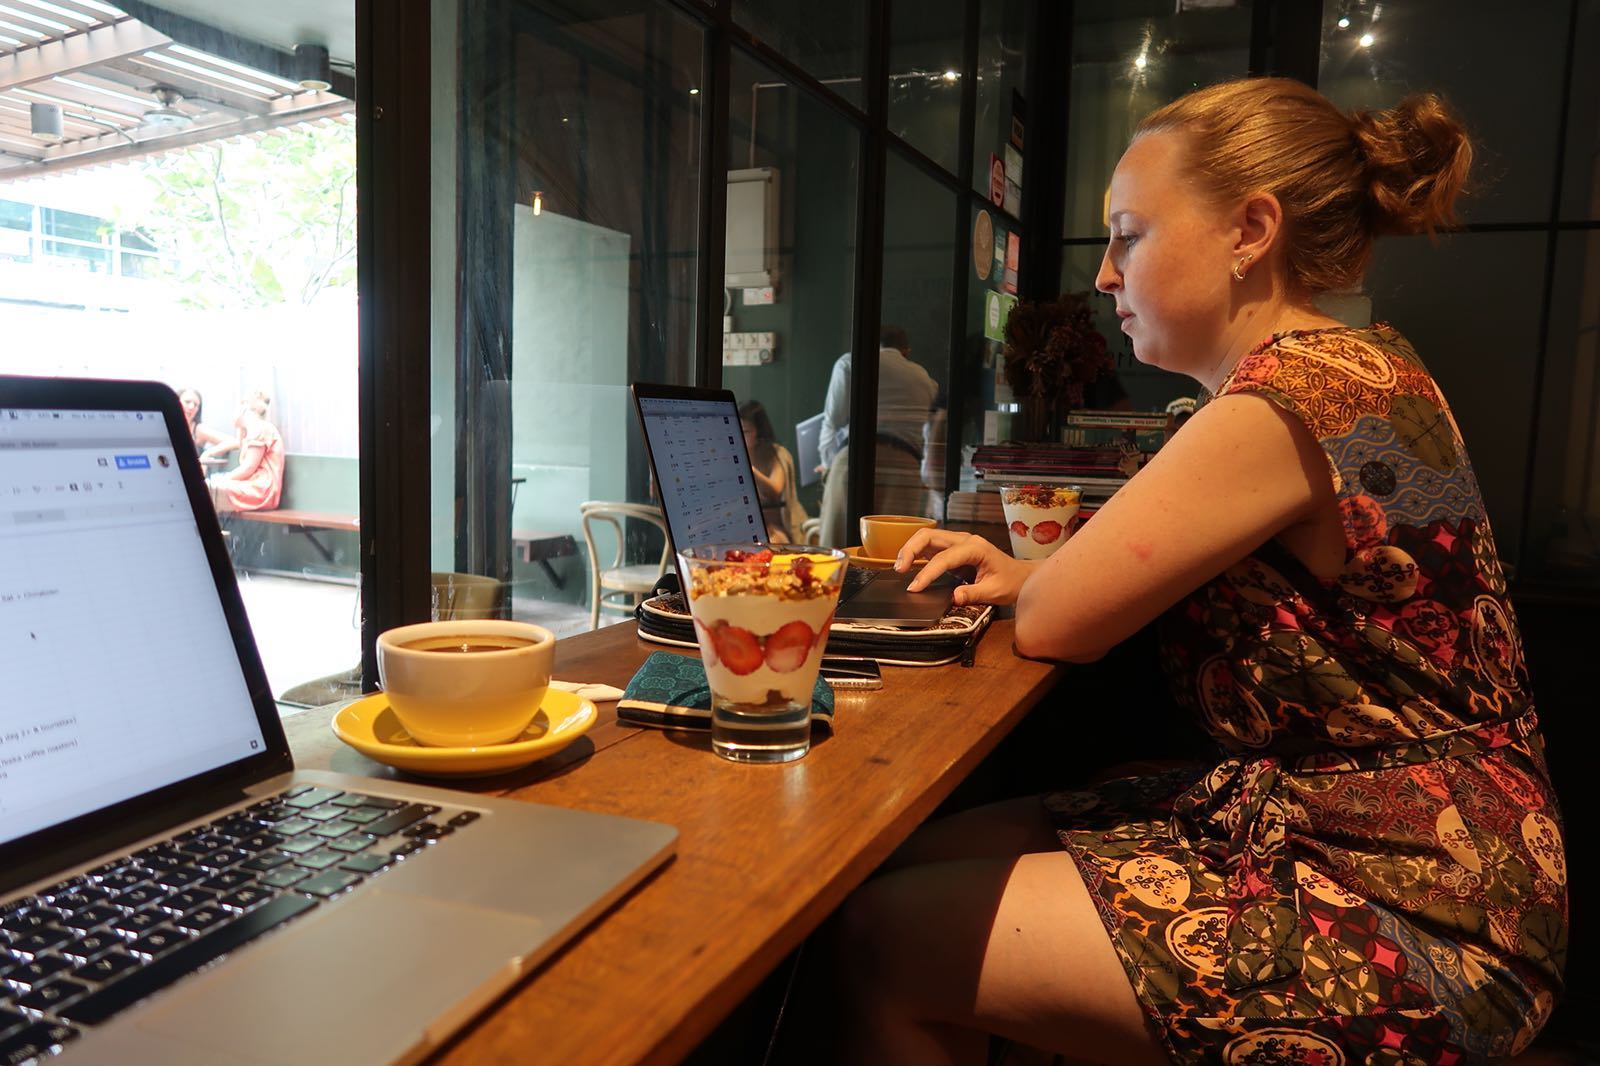 digital nomad Eleni Hoefsloot